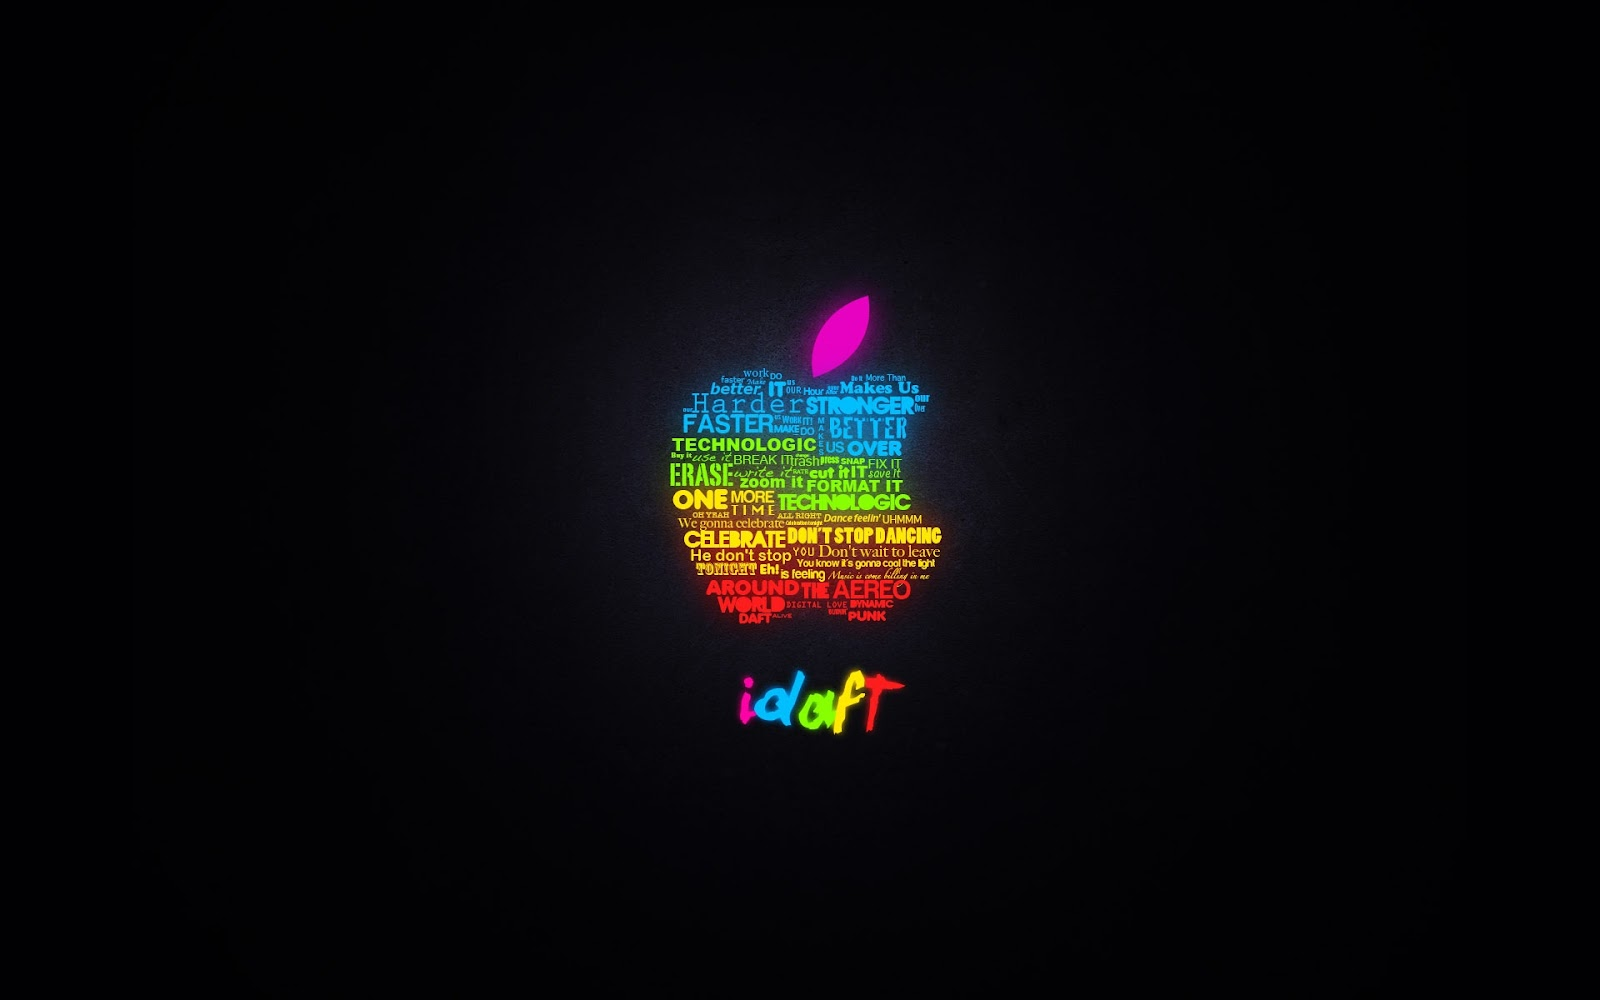 http://4.bp.blogspot.com/-3rLu8RcFoRM/T92av3C7z3I/AAAAAAAADYs/dNIWzSdE830/s1600/Apple+HDWallpapers+%25283%2529.jpg